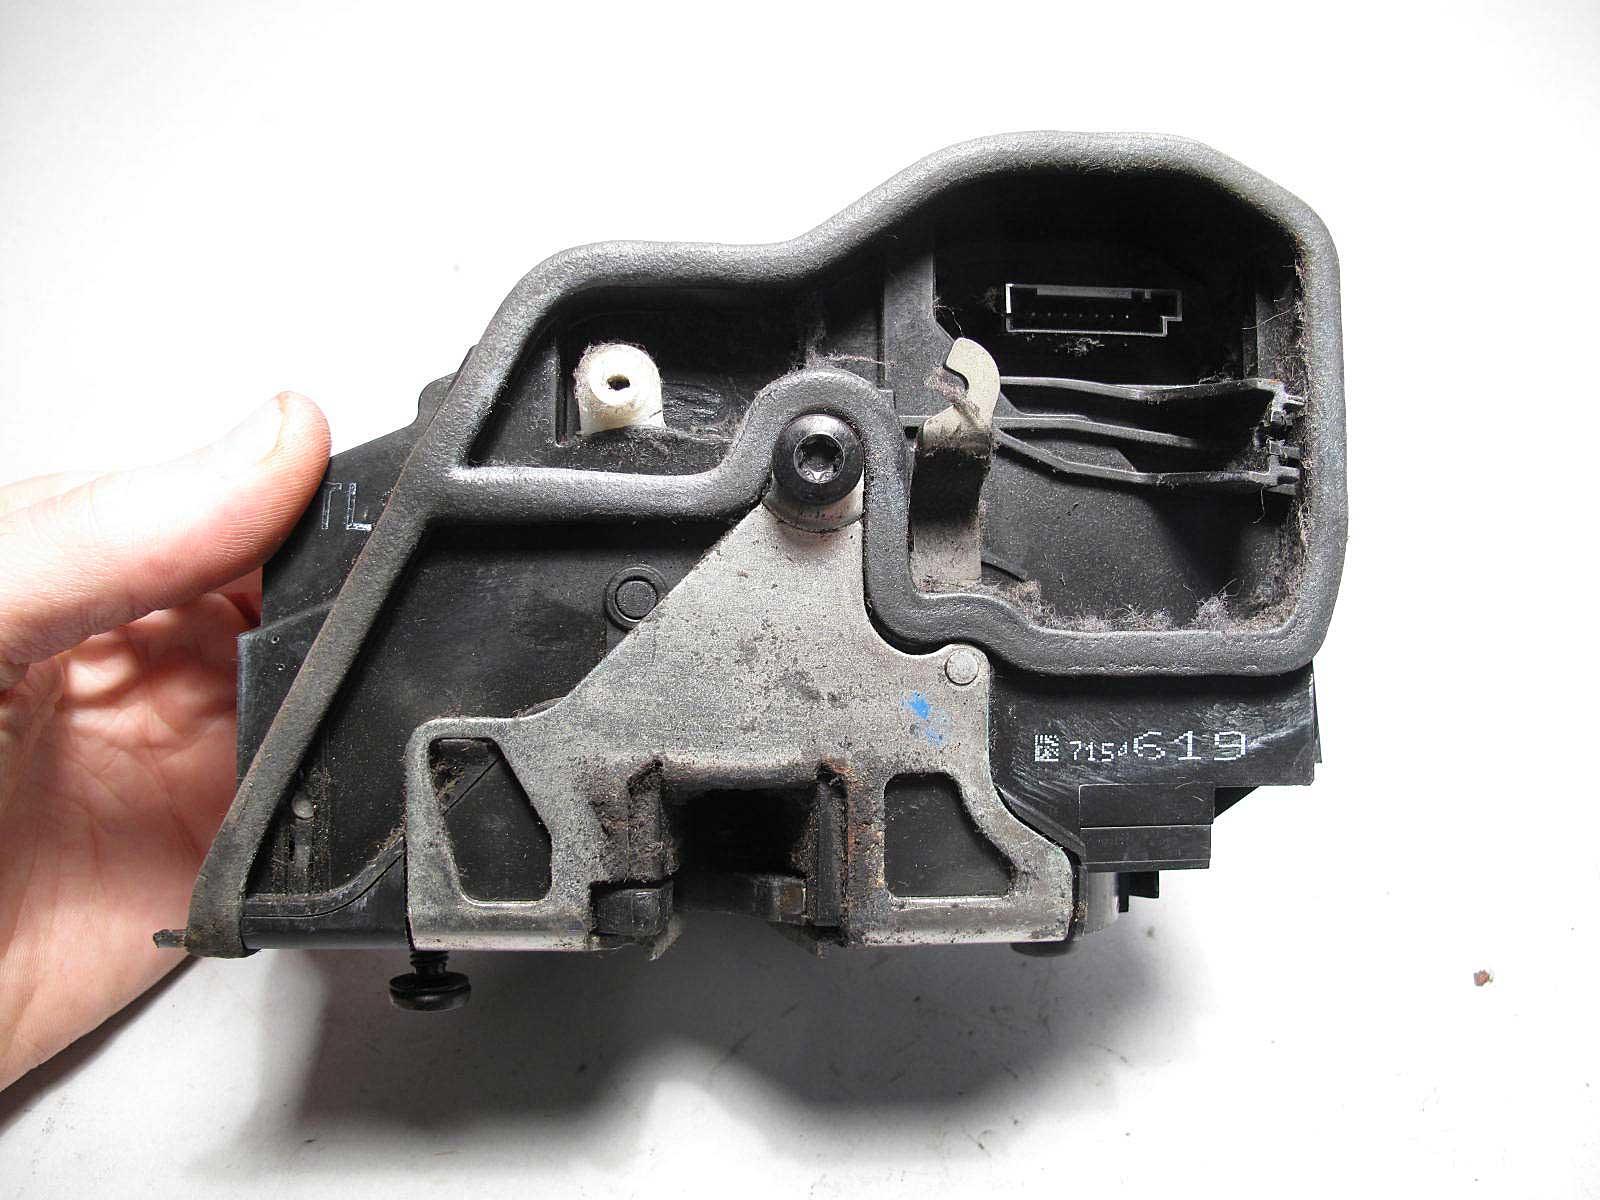 2004 2015 Bmw Left Front Drivers Door Latch Lock Actuator E60 E90 Z4 Wiring Diagram F10 F30 Oem